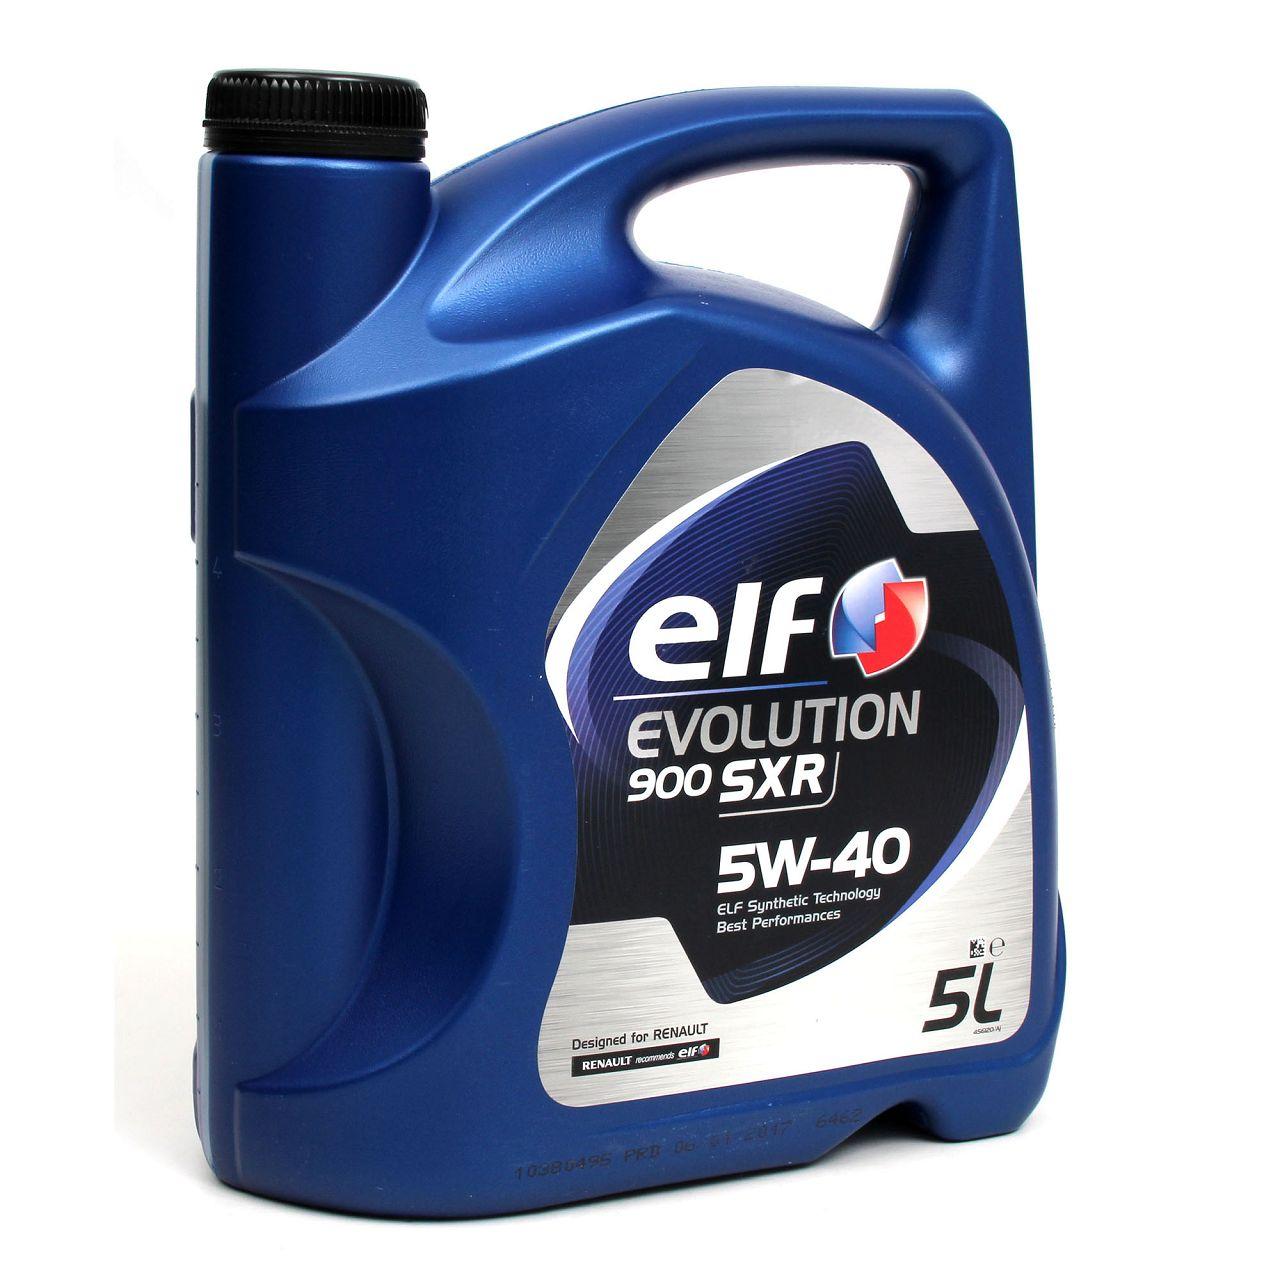 elf Evolution 900 SXR 5W-40 Motoröl RN0700 RN0710 MERCEDES 226.5 - 5L 5 Liter